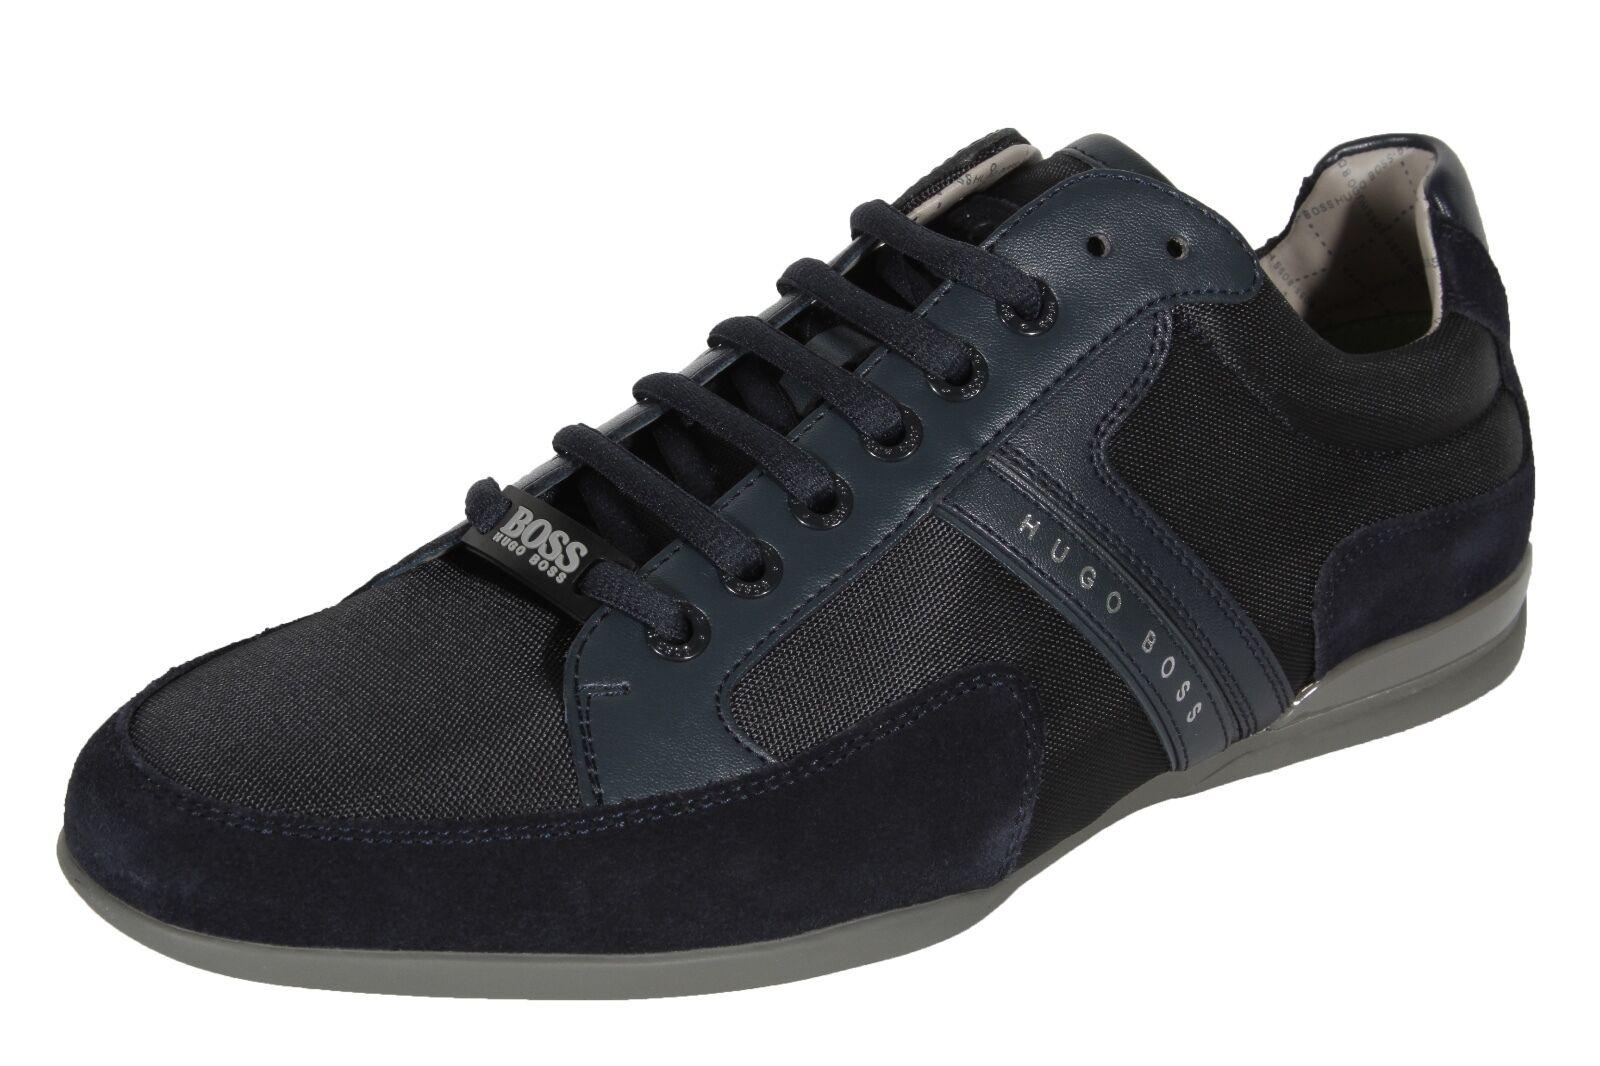 Hugo BOSS Green Spacit Men's Fashion Sneakers shoes 50247632 417 Navy bluee